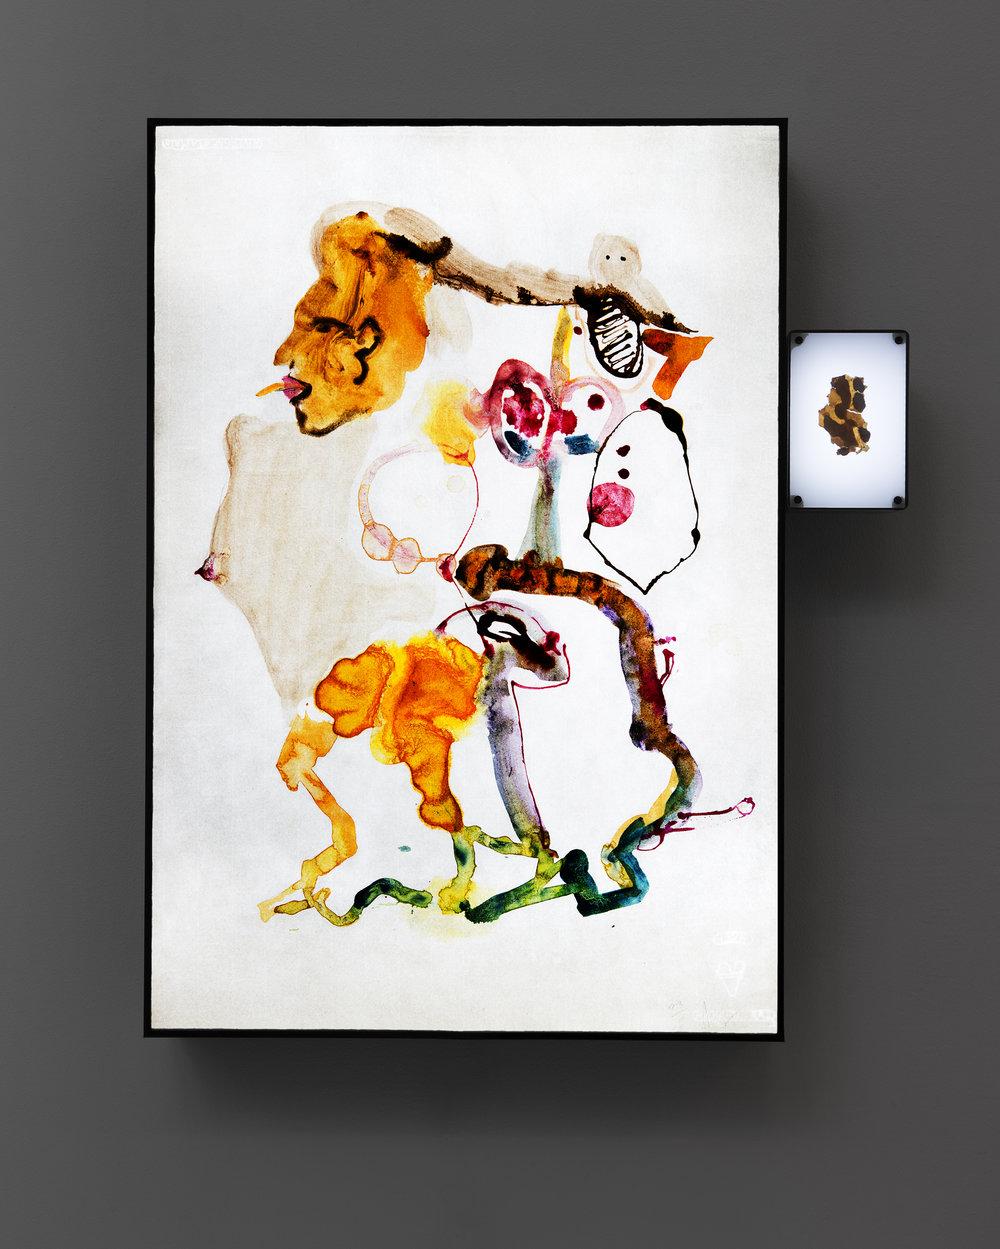 Ulf Rollof   Barkteckning 1  2019 61 x 50 x 10 cm Mixed media. Cotton Paper. Acrylic. Electrical.